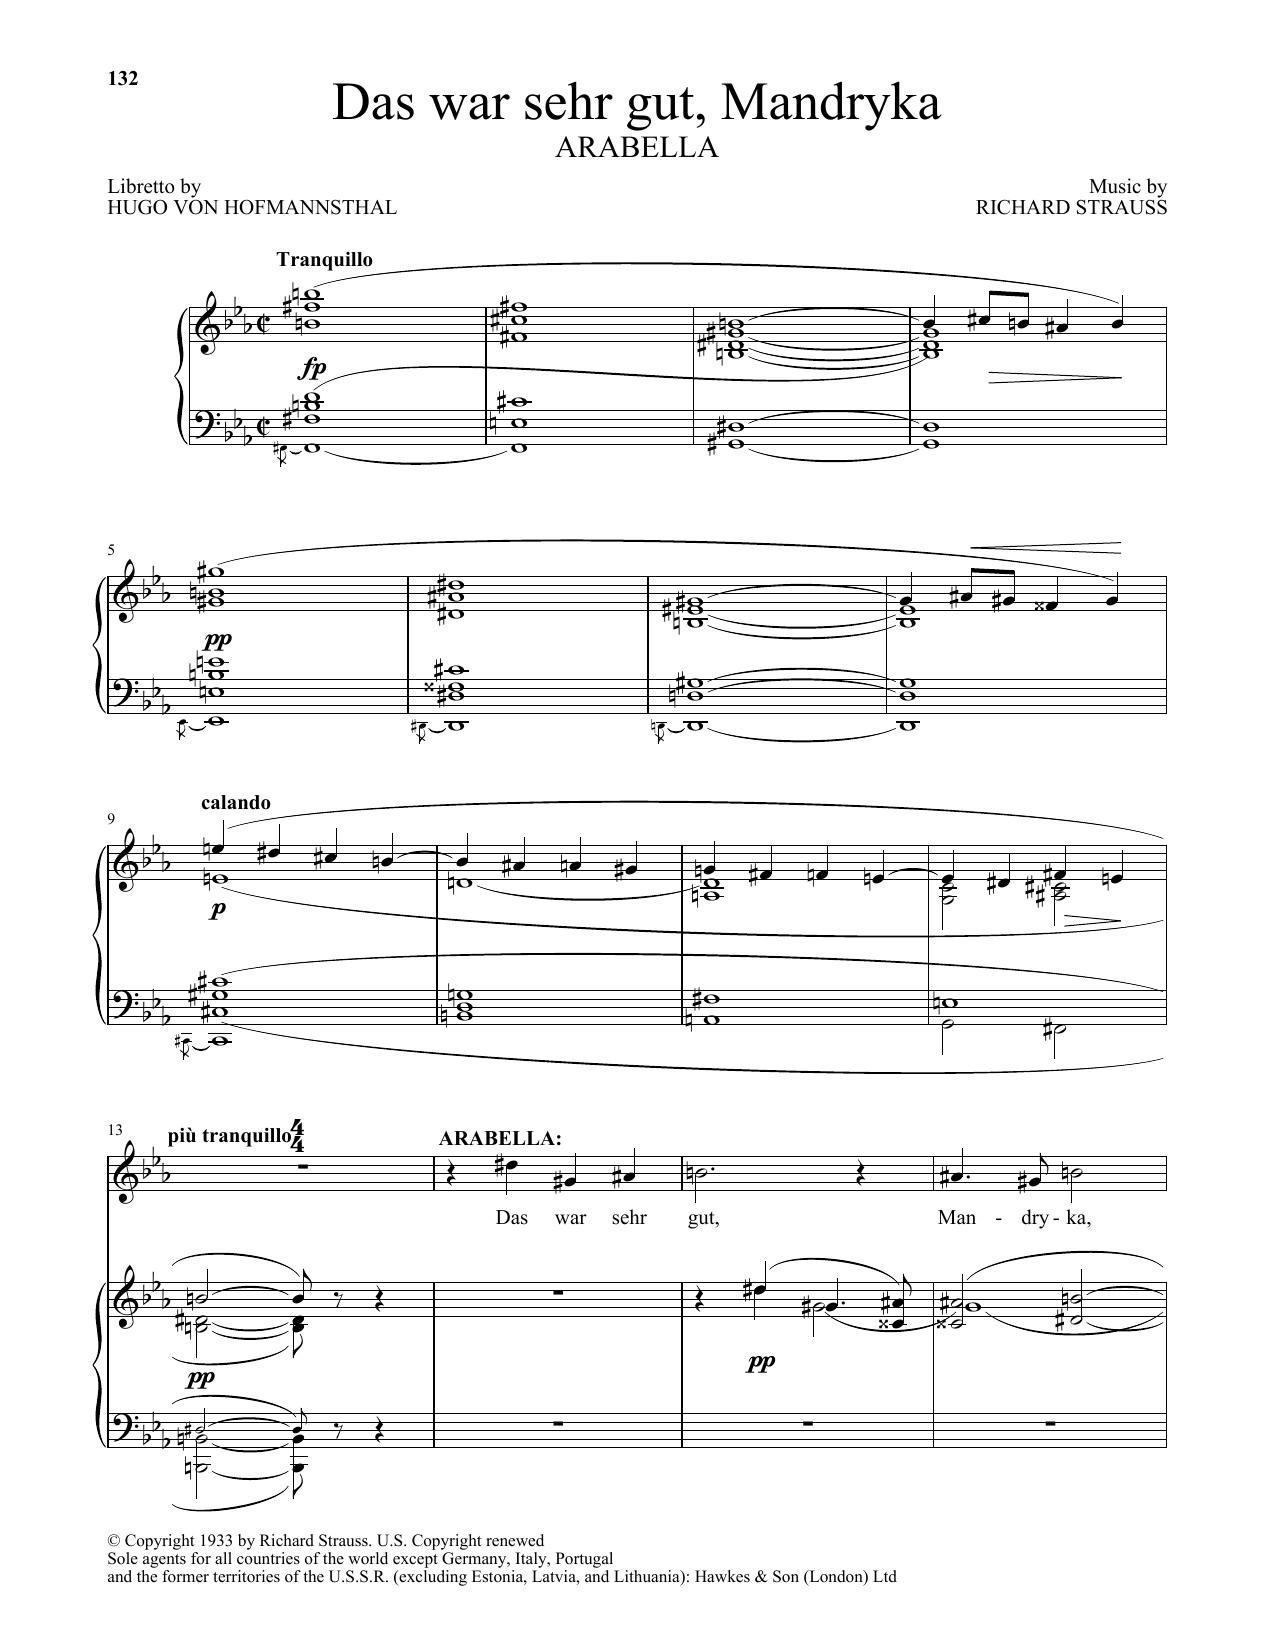 Das War Sehr Gut, Mandryka (from Arabella) (Piano & Vocal)